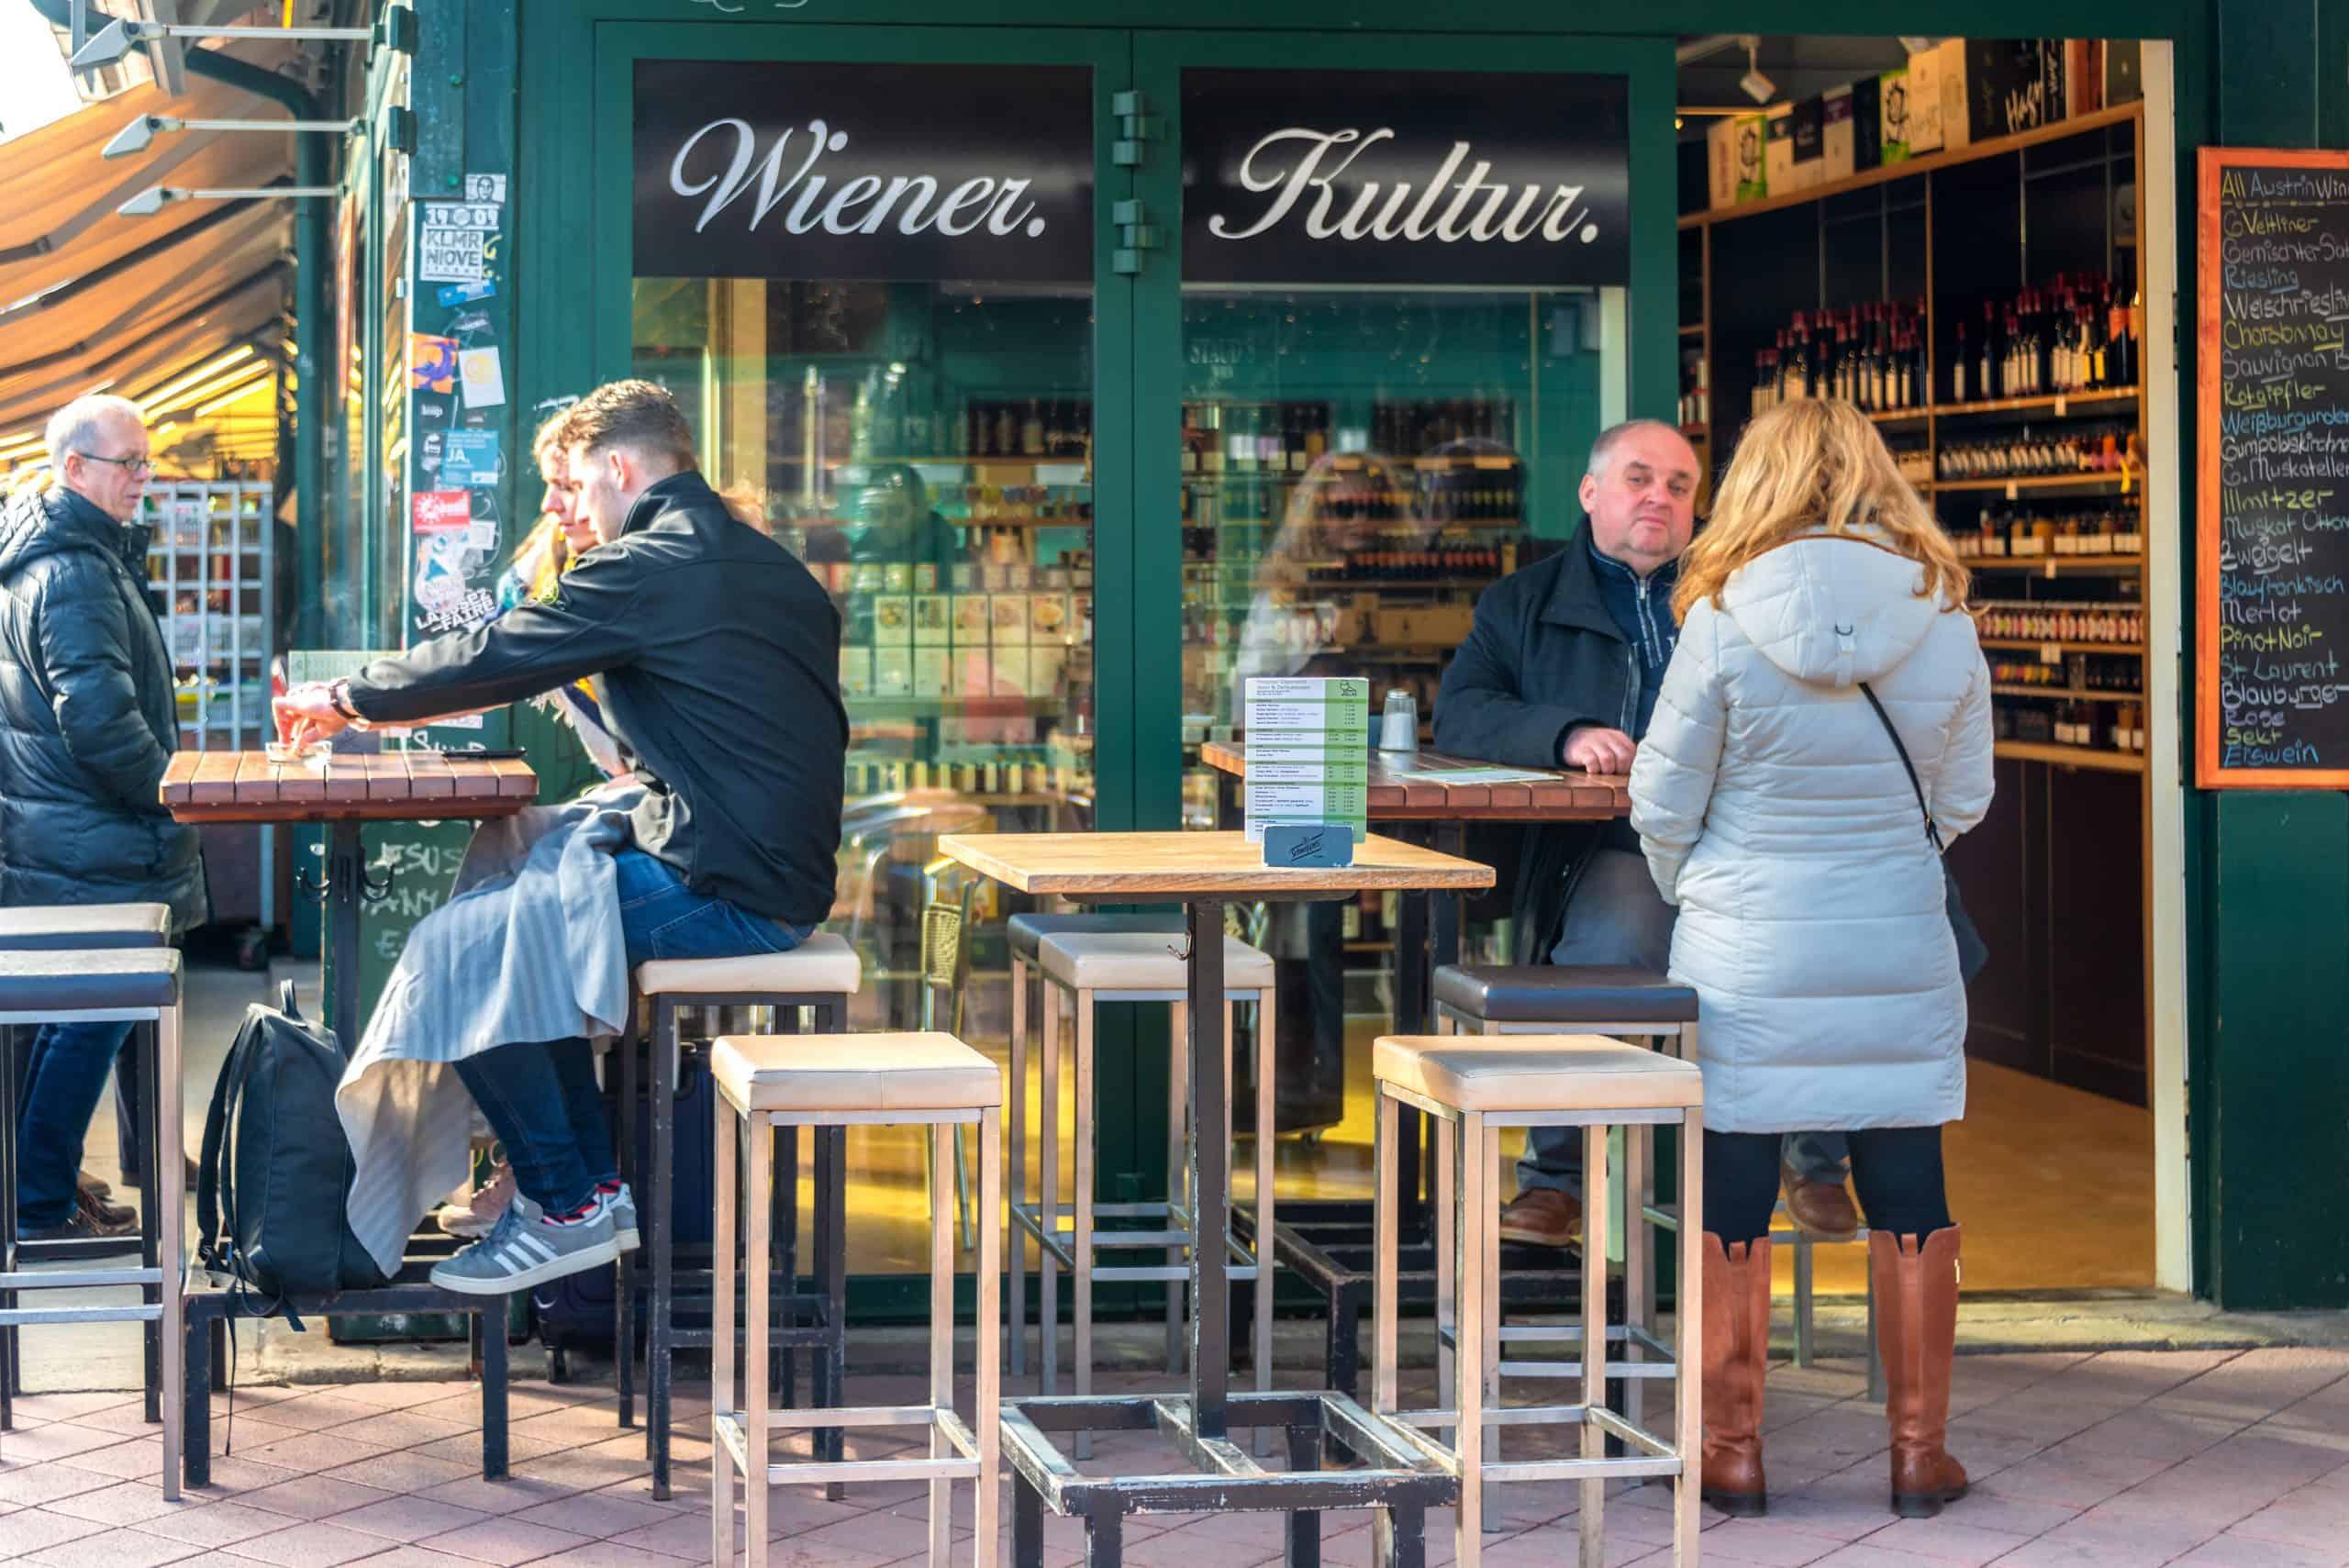 Außengastronomie in Wien